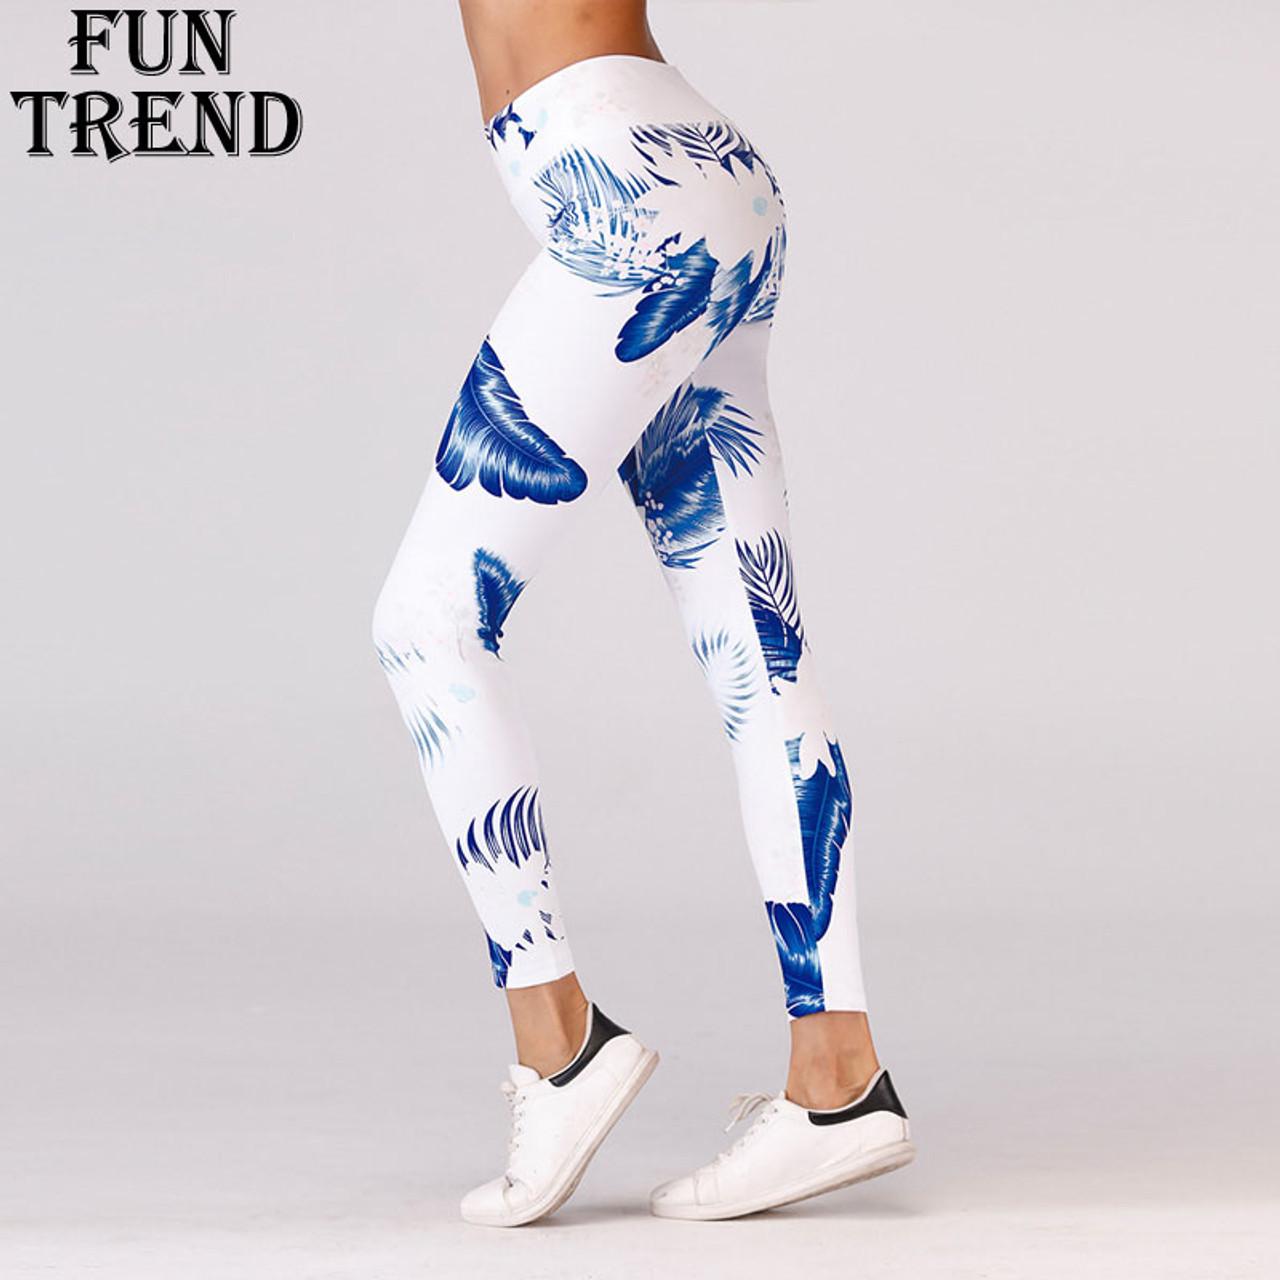 c5ee31d51daf89 Yoga Pants Fitness Women Sport Leggings Push Up High Waist Yoga Leggings  Sport Pants Women Workout ...